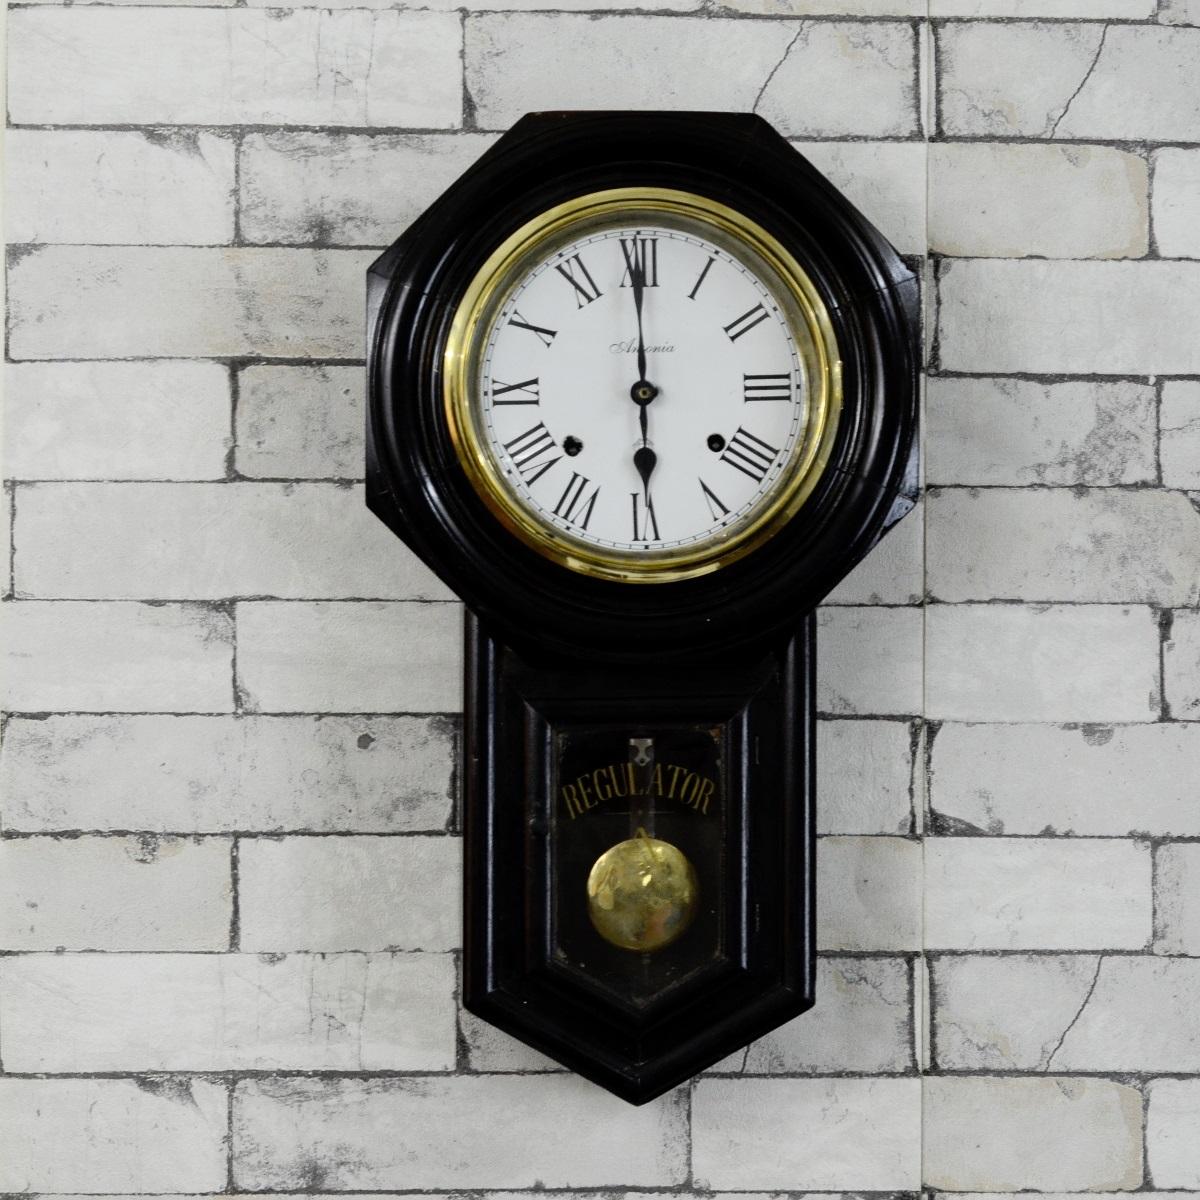 Antique Ansonia Regulator Winding Pendulum Wall Clock